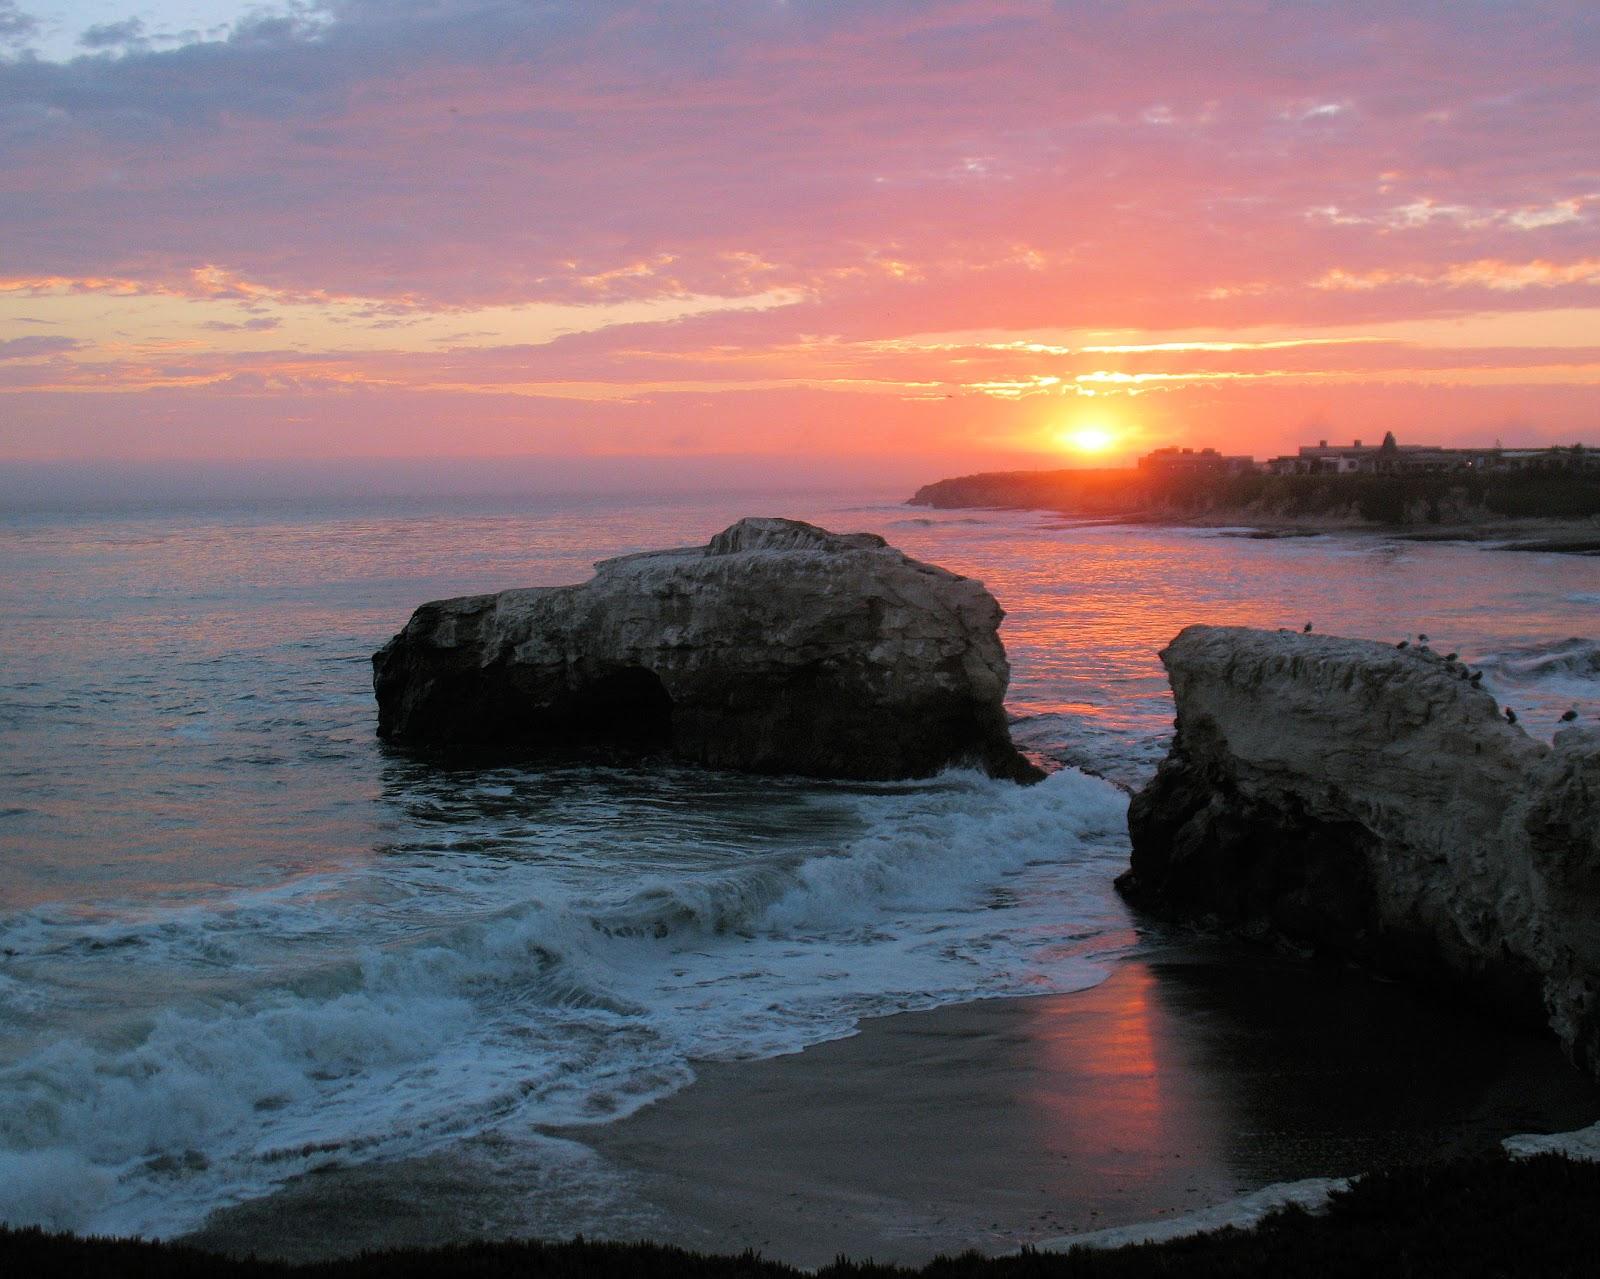 California Beach Beautiful Sunset Wallpaper on this Beach Wallpaper 1600x1279